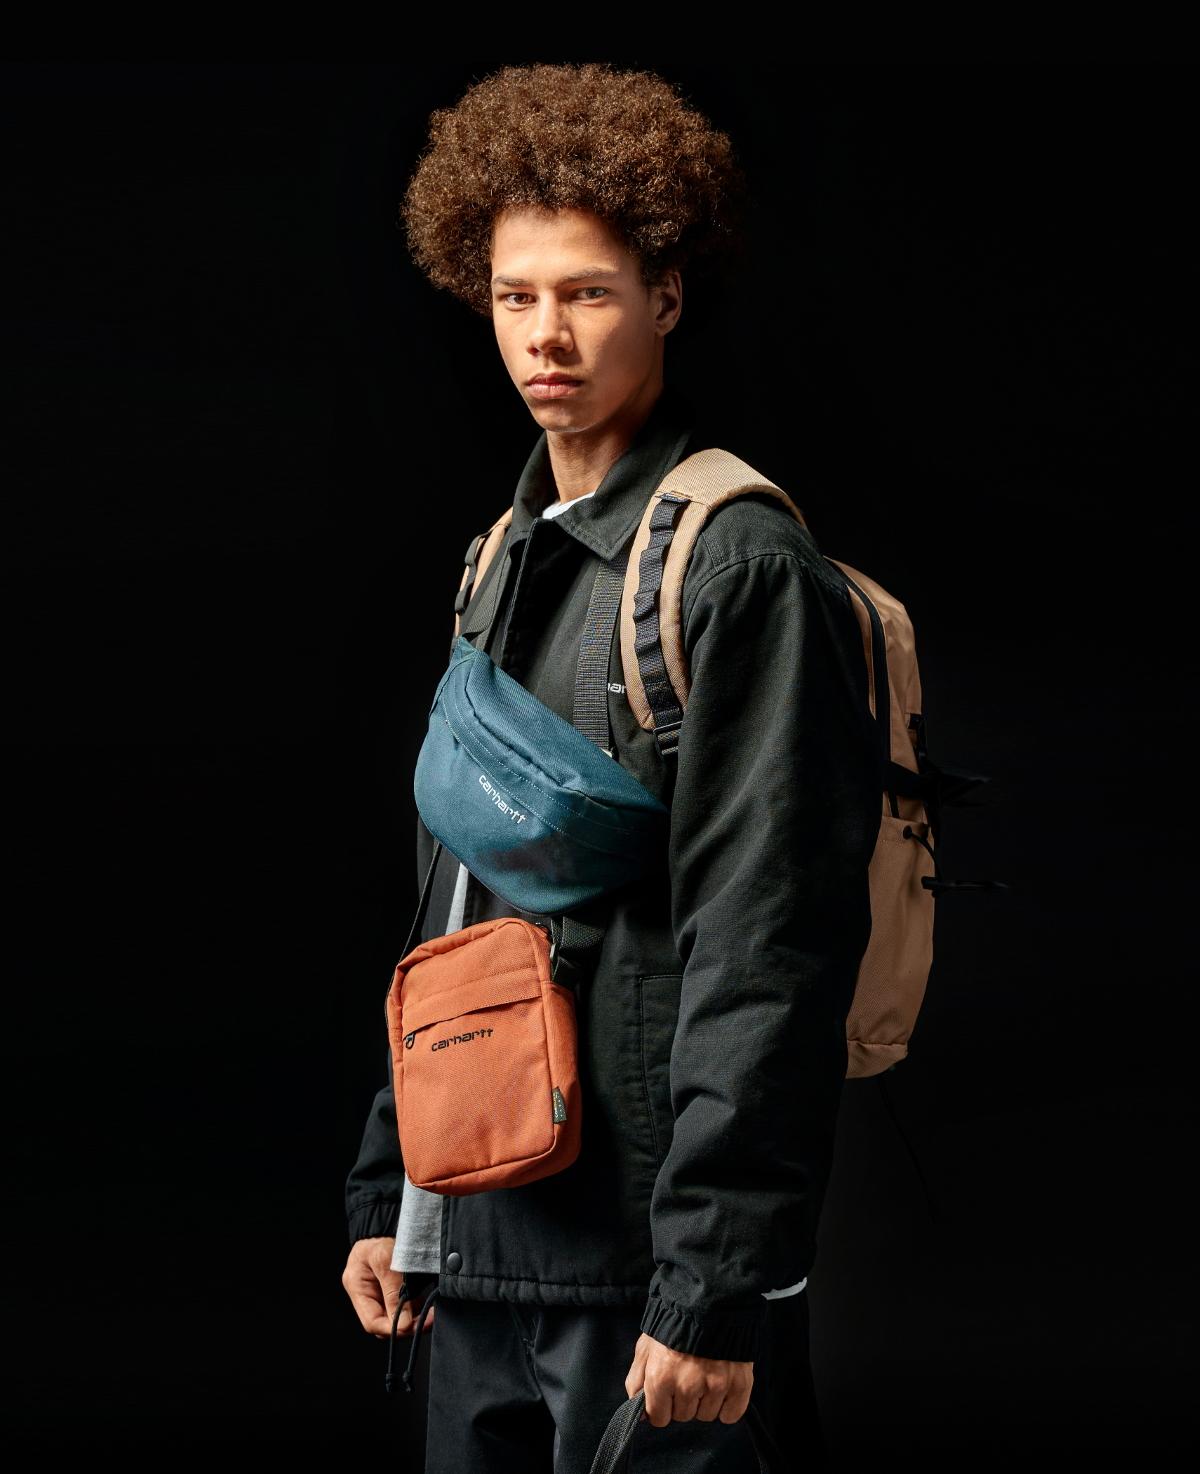 Carhartt-WIP-Fall-2020-Backpacks-Bags-Accessories1.jpg